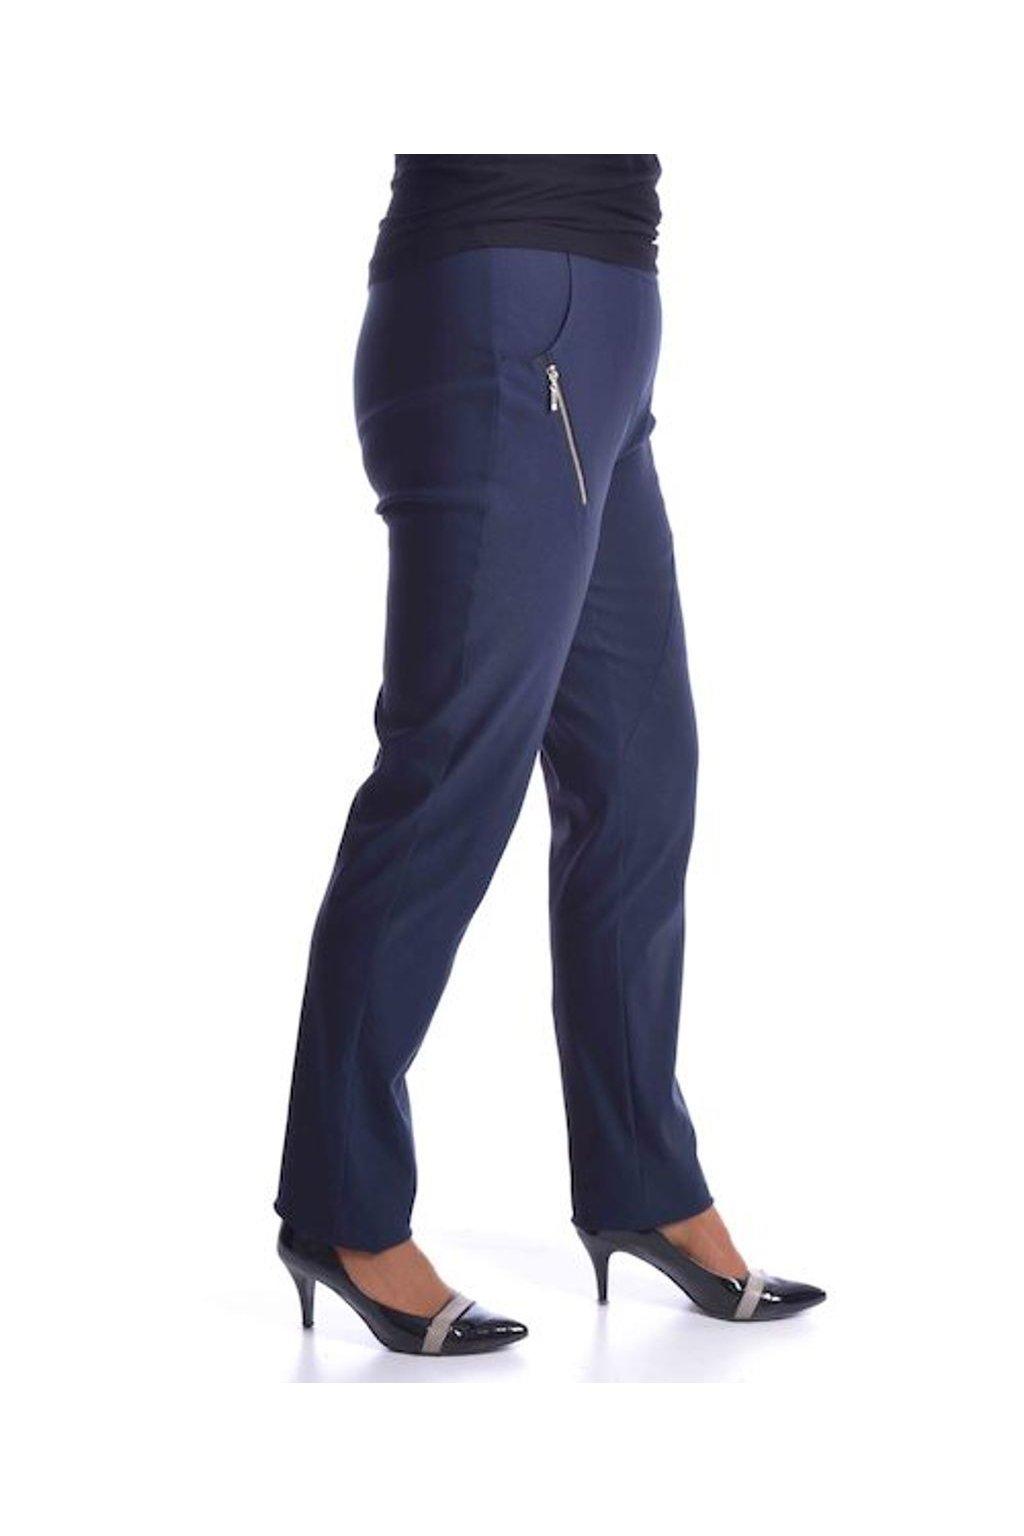 62T Kalhoty Zita (Velikost 38, Barva Modrá)